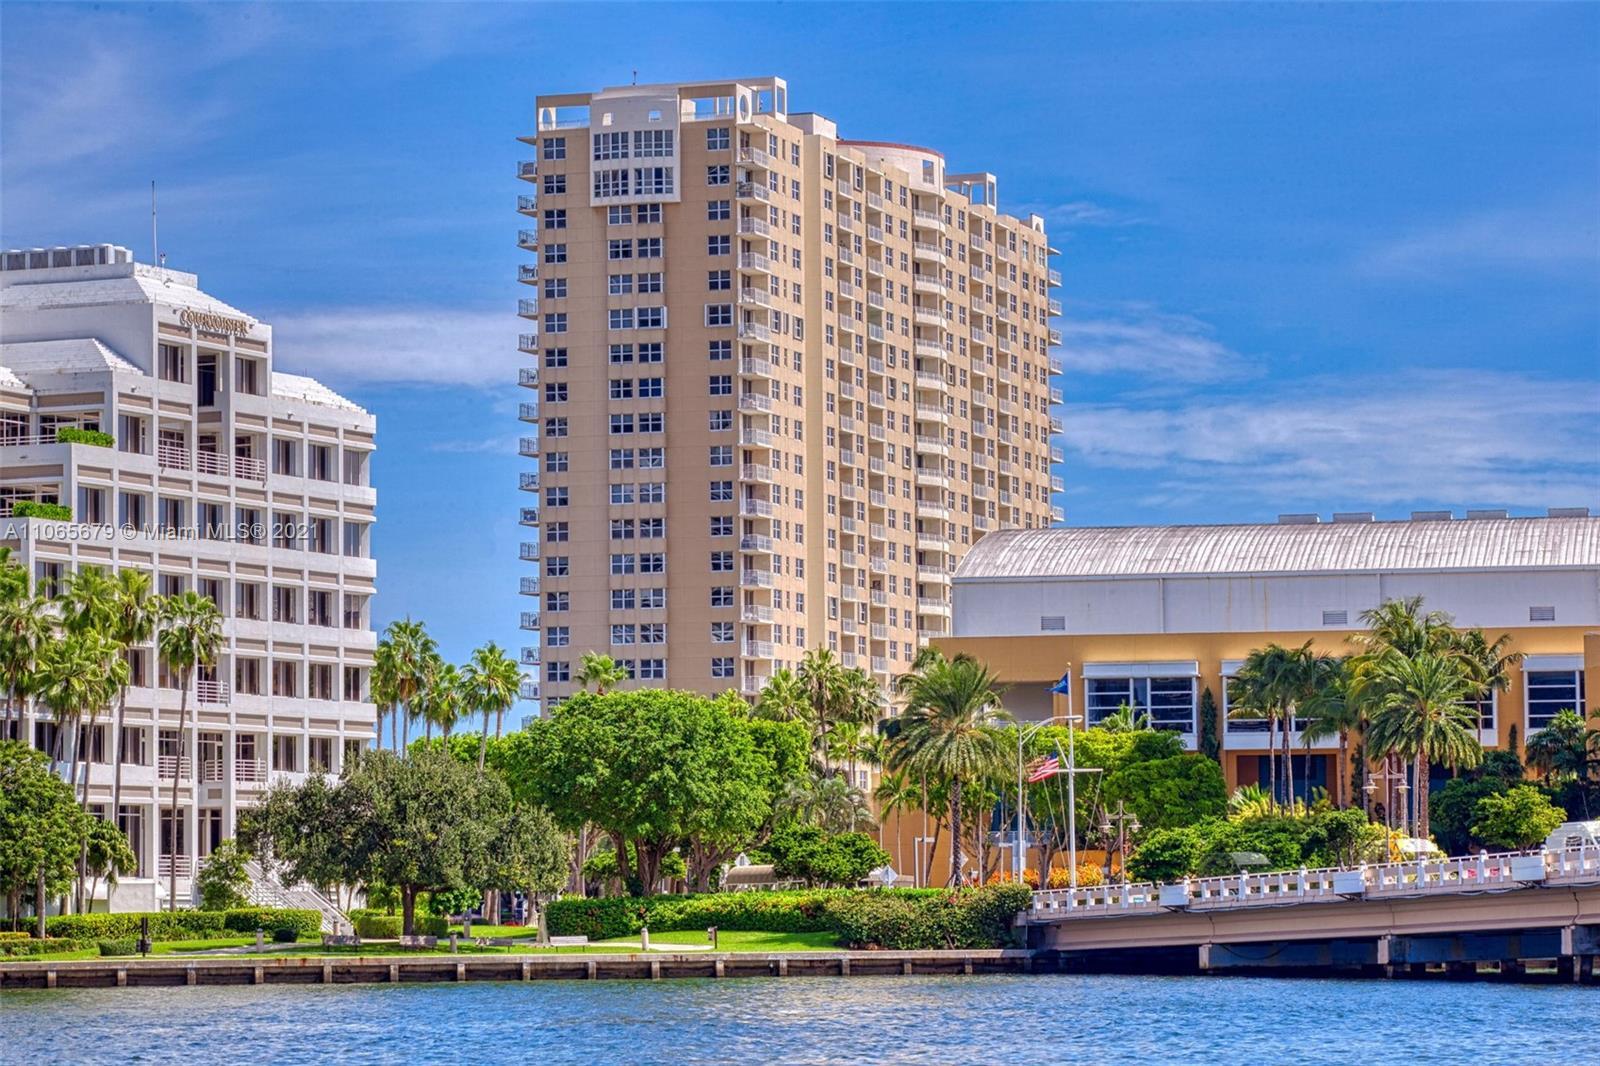 Isola #806 - 770 Claughton Island Dr #806, Miami, FL 33131